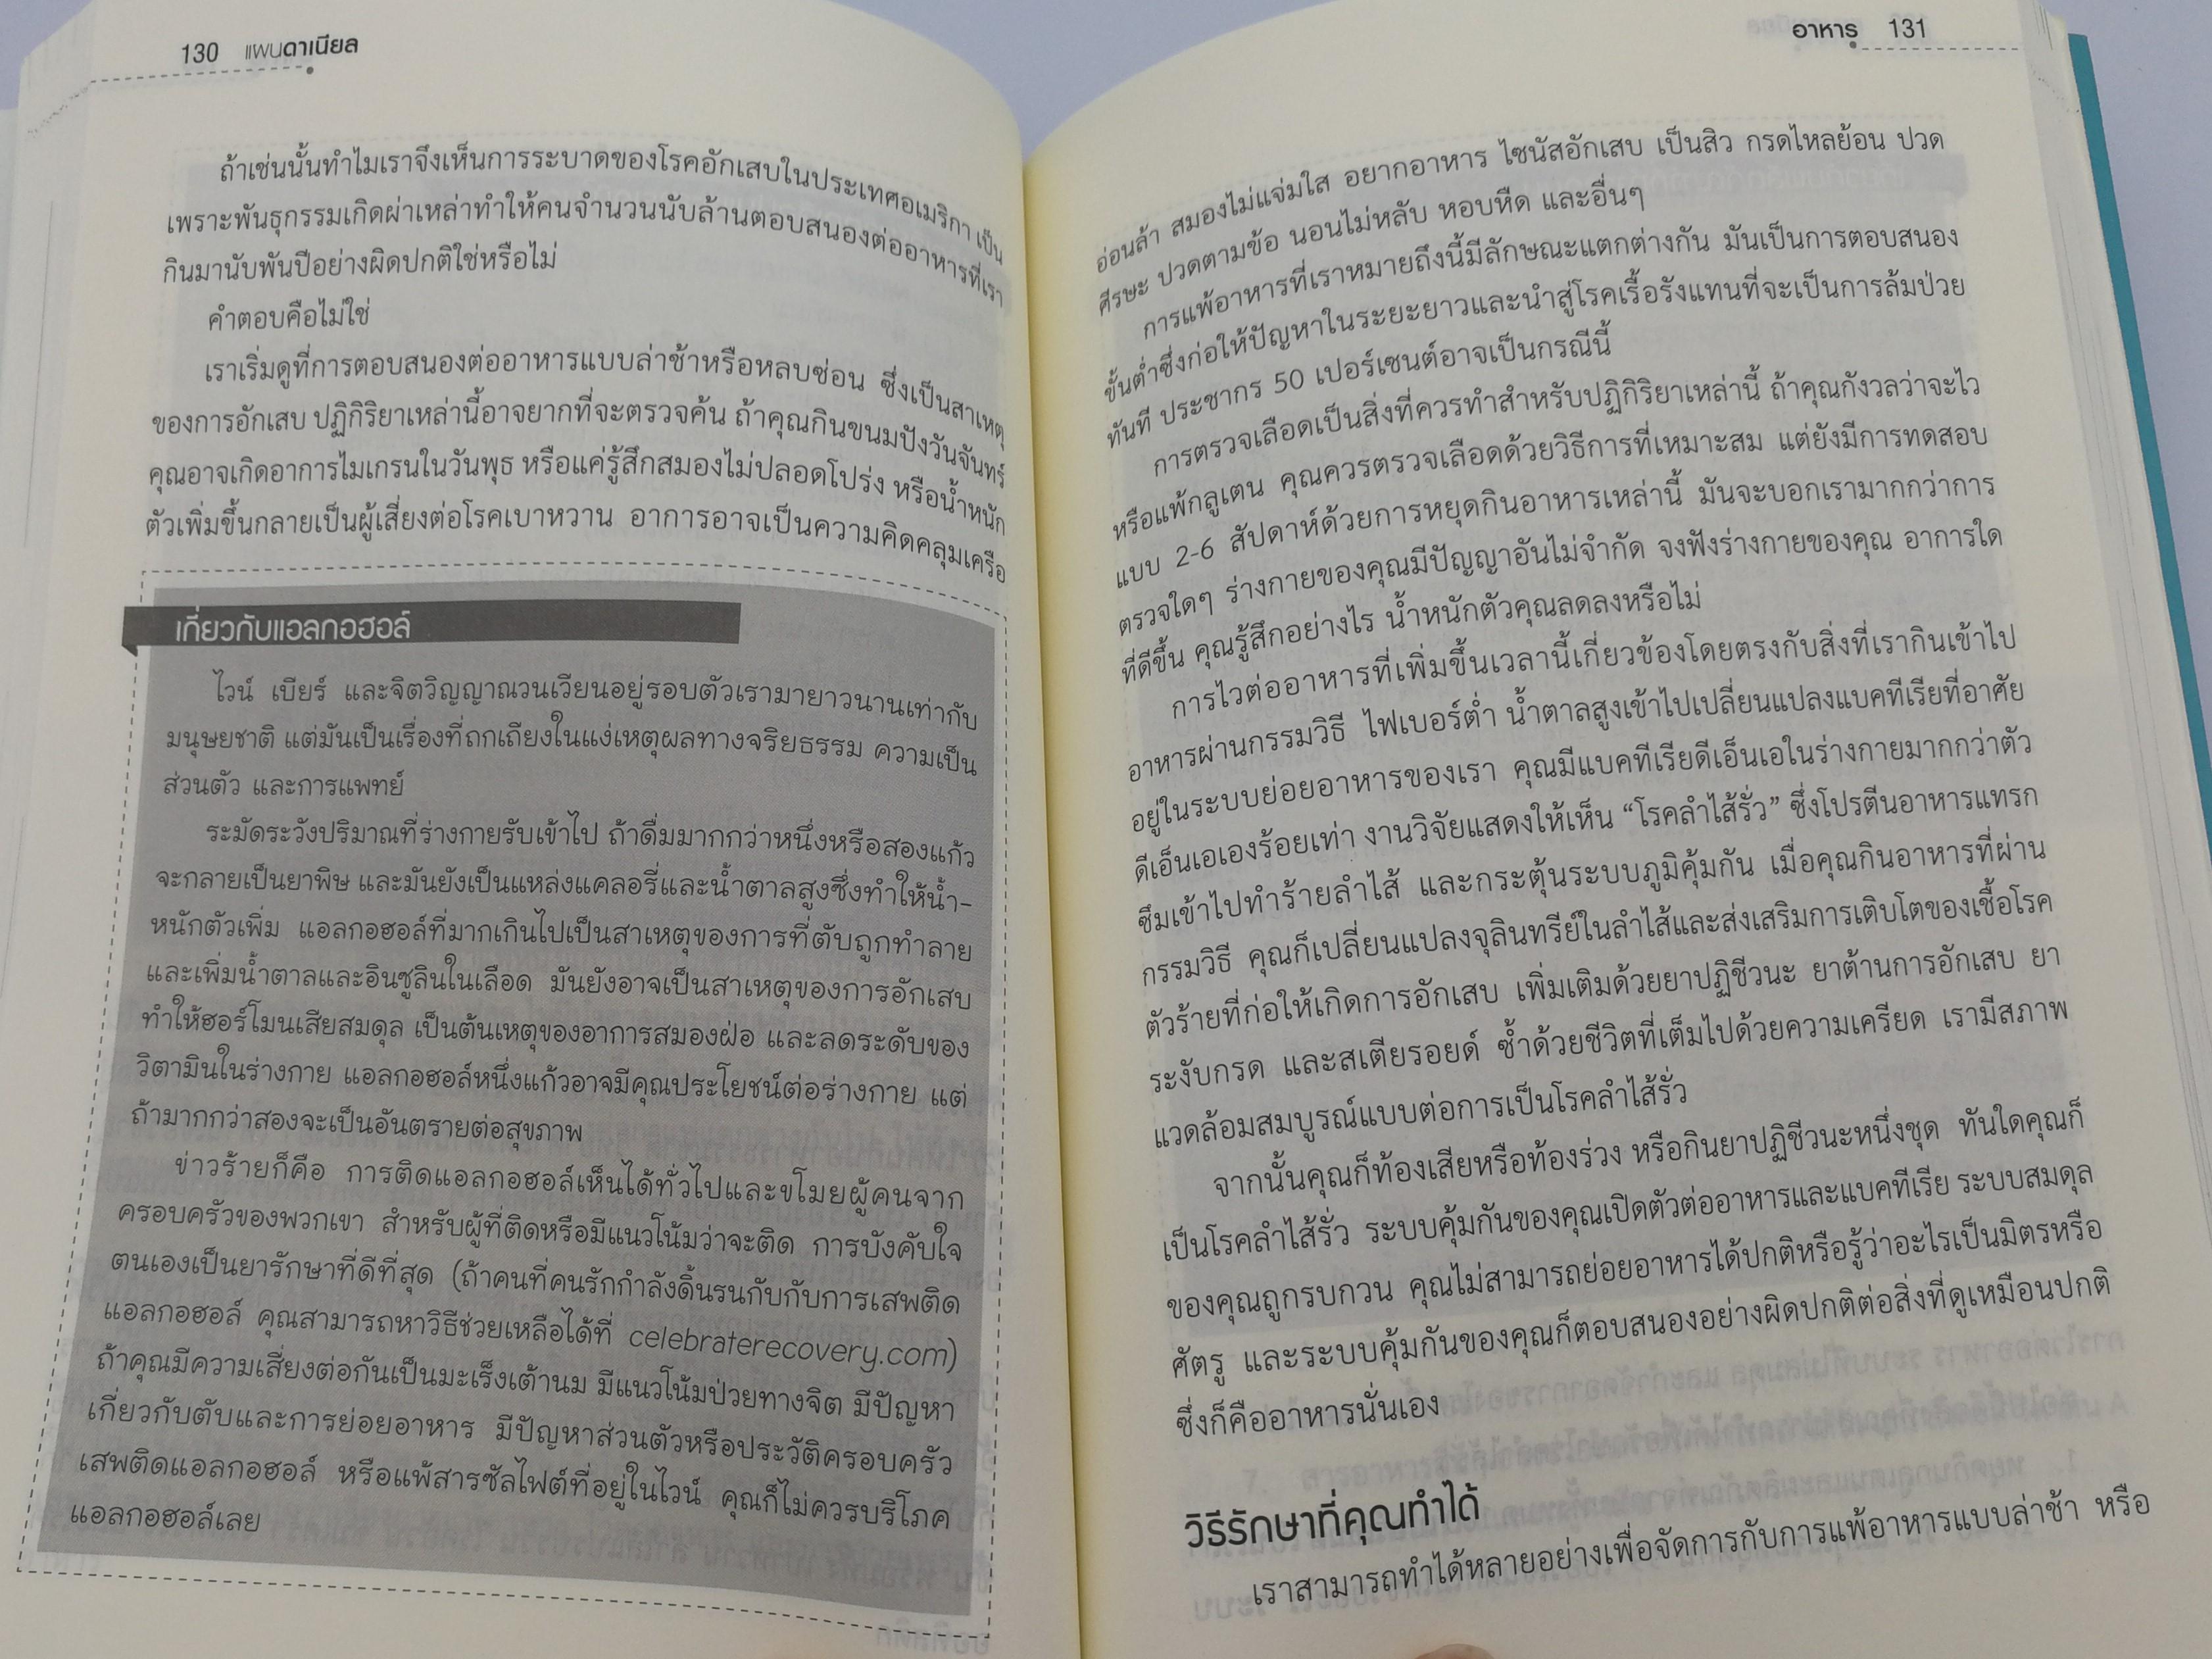 -ced-thai-language-edition-of-the-daniel-plan-9.jpg